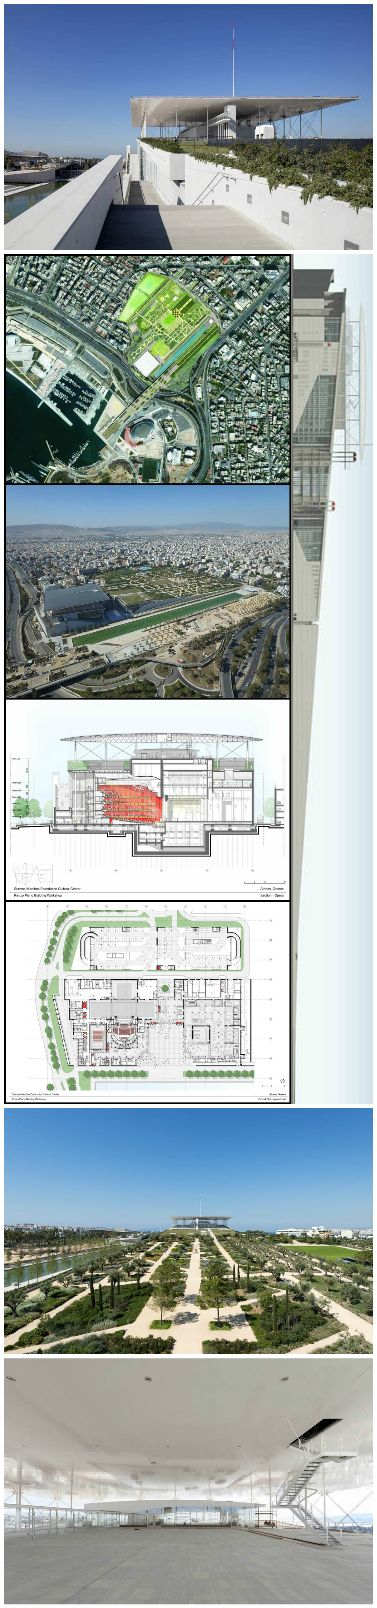 Stavros Niarchos Foundation Cultural Centre / Renzo Piano Building Workshop/ 216…